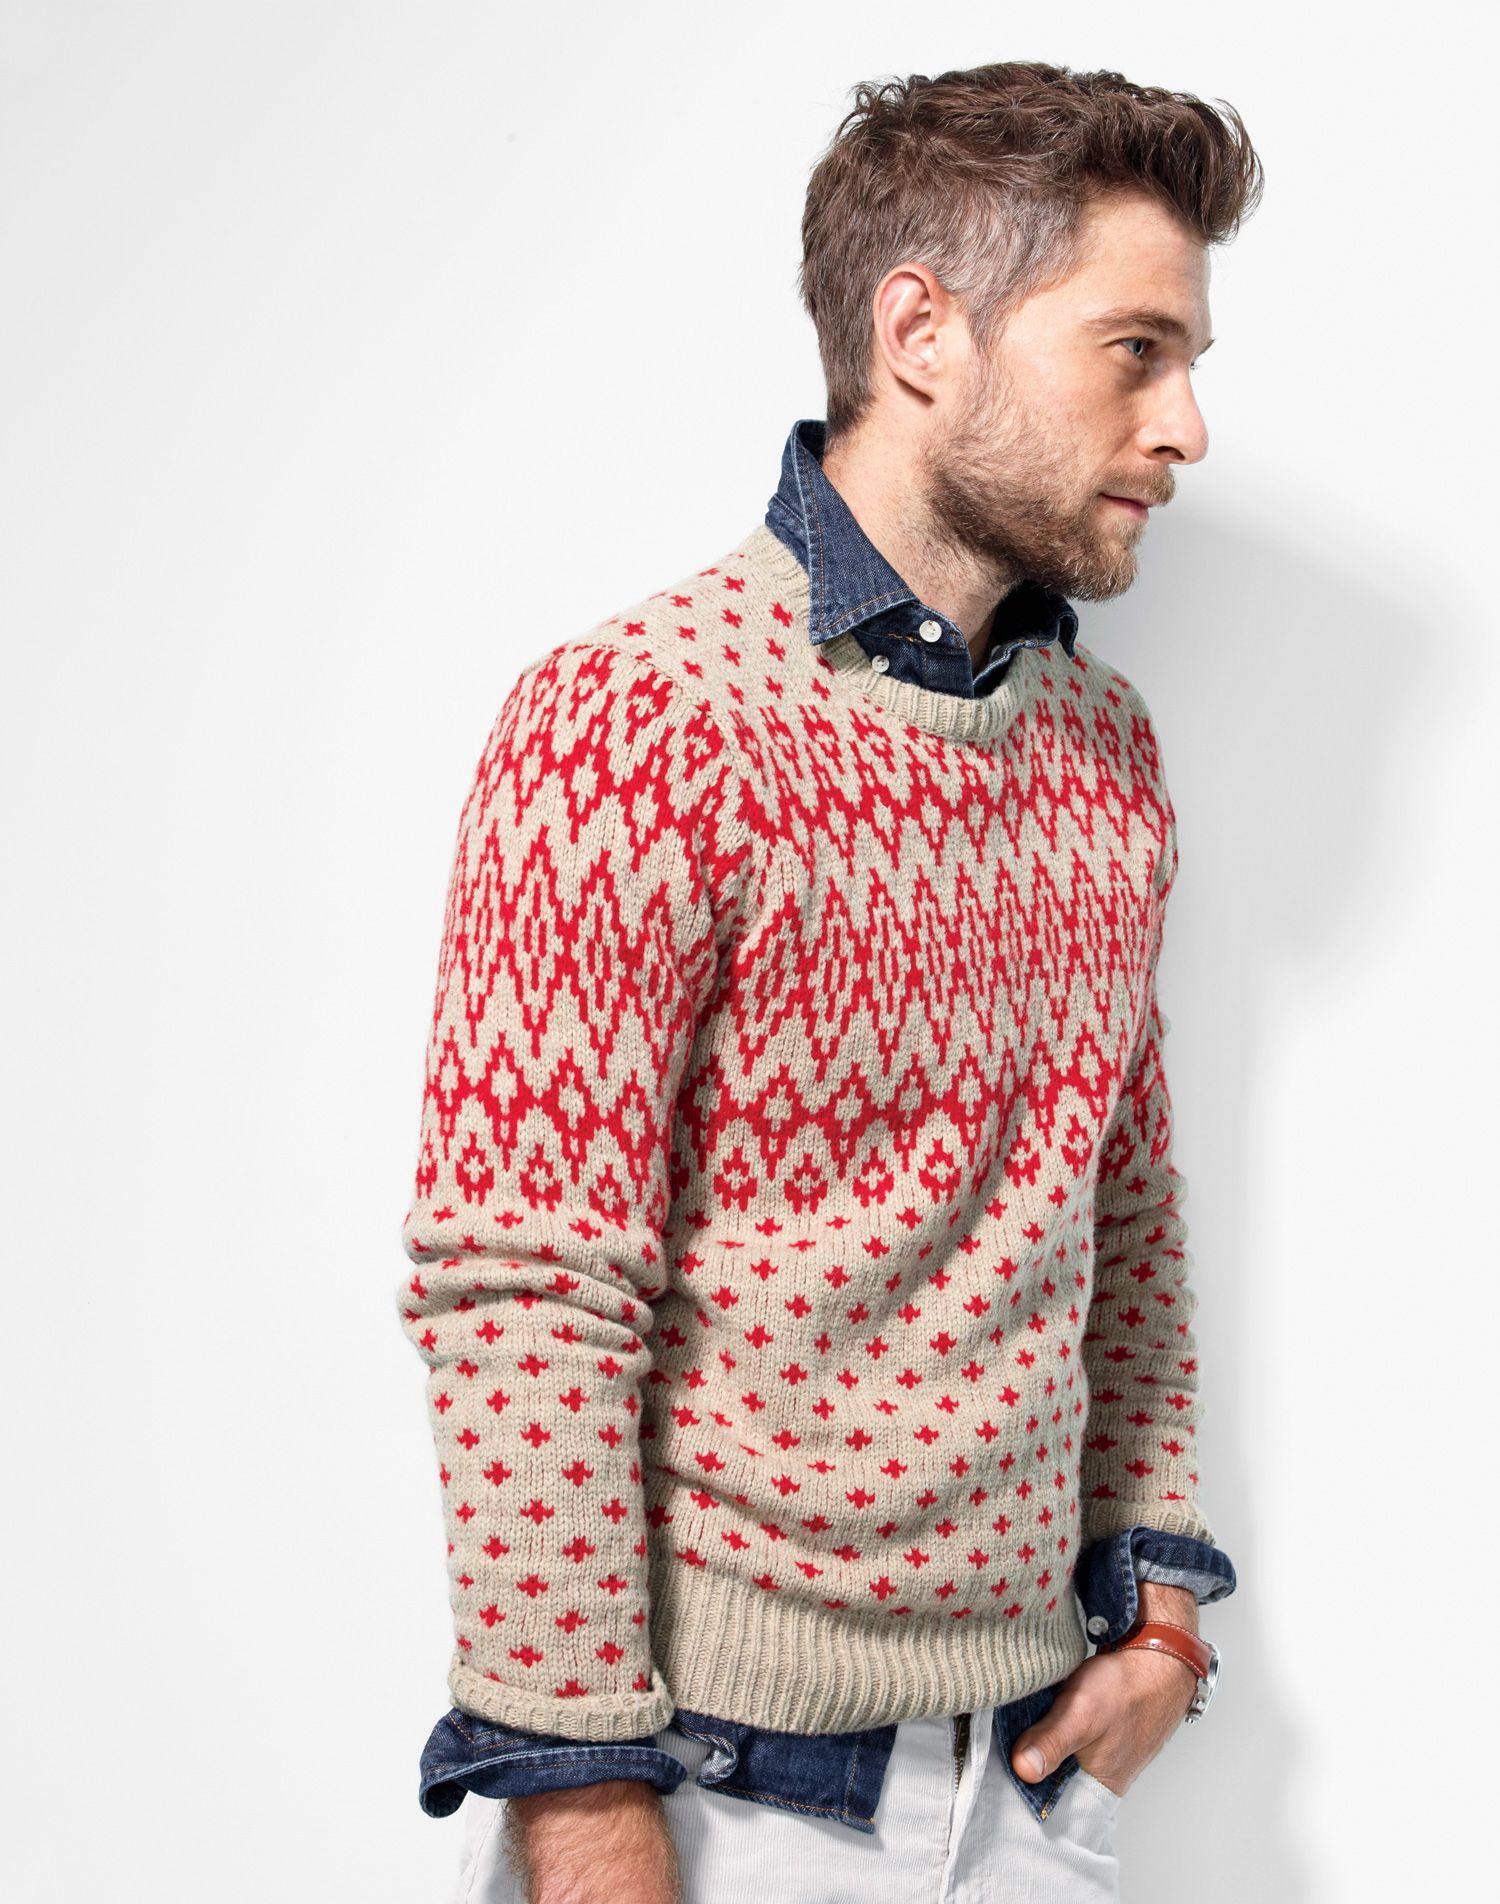 Nordic Diamond Sweater Stylische männer, Männer outfit